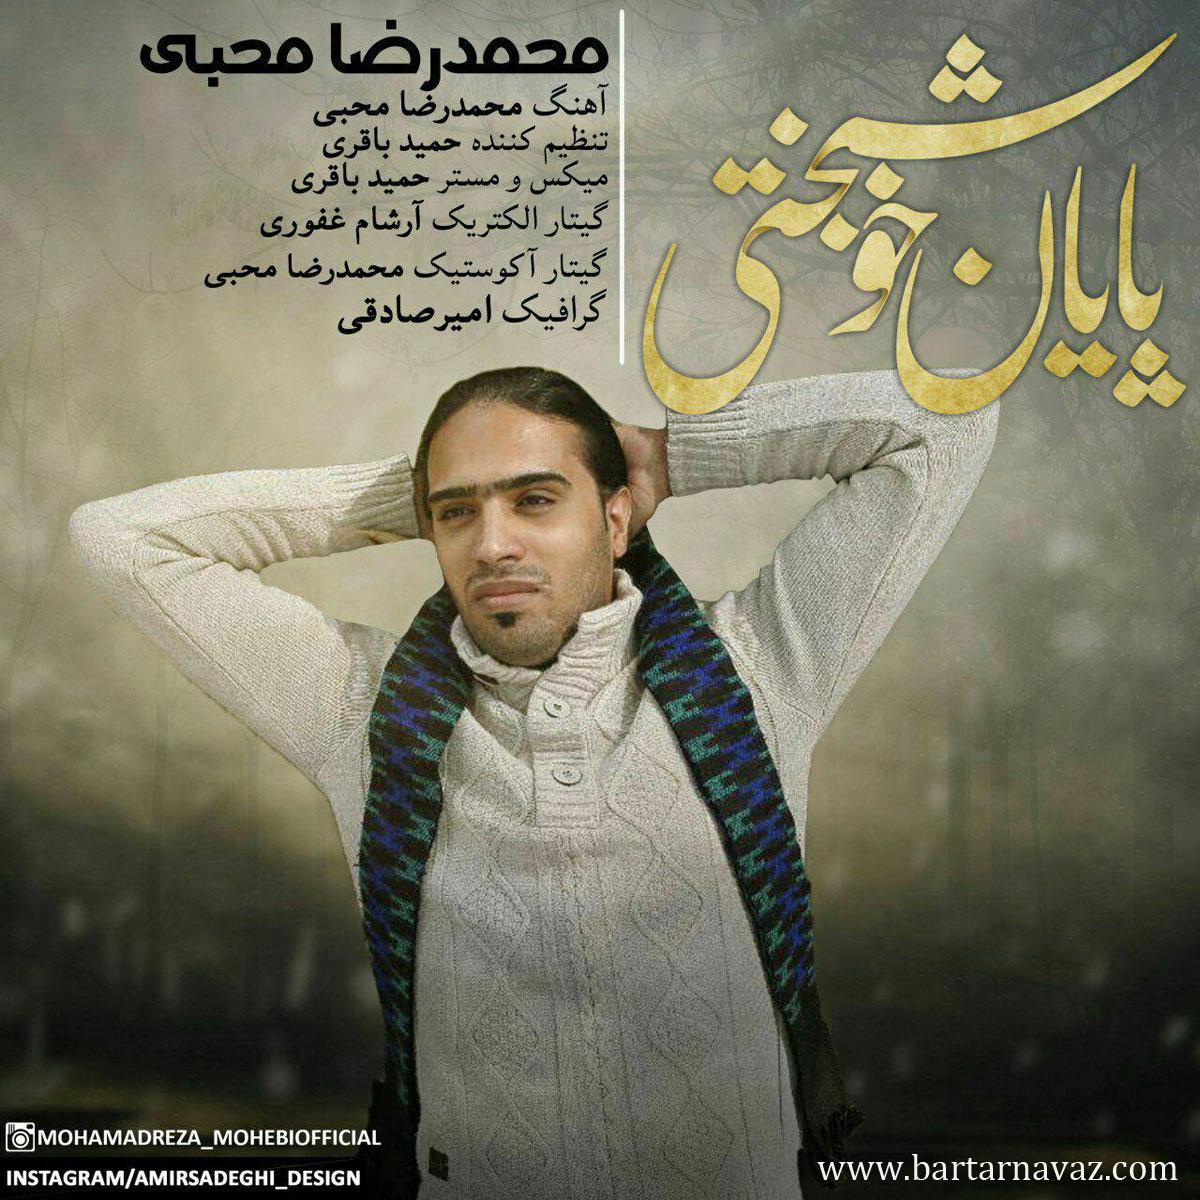 Mohammadreza Mohebi – Payane Khoshbakhti